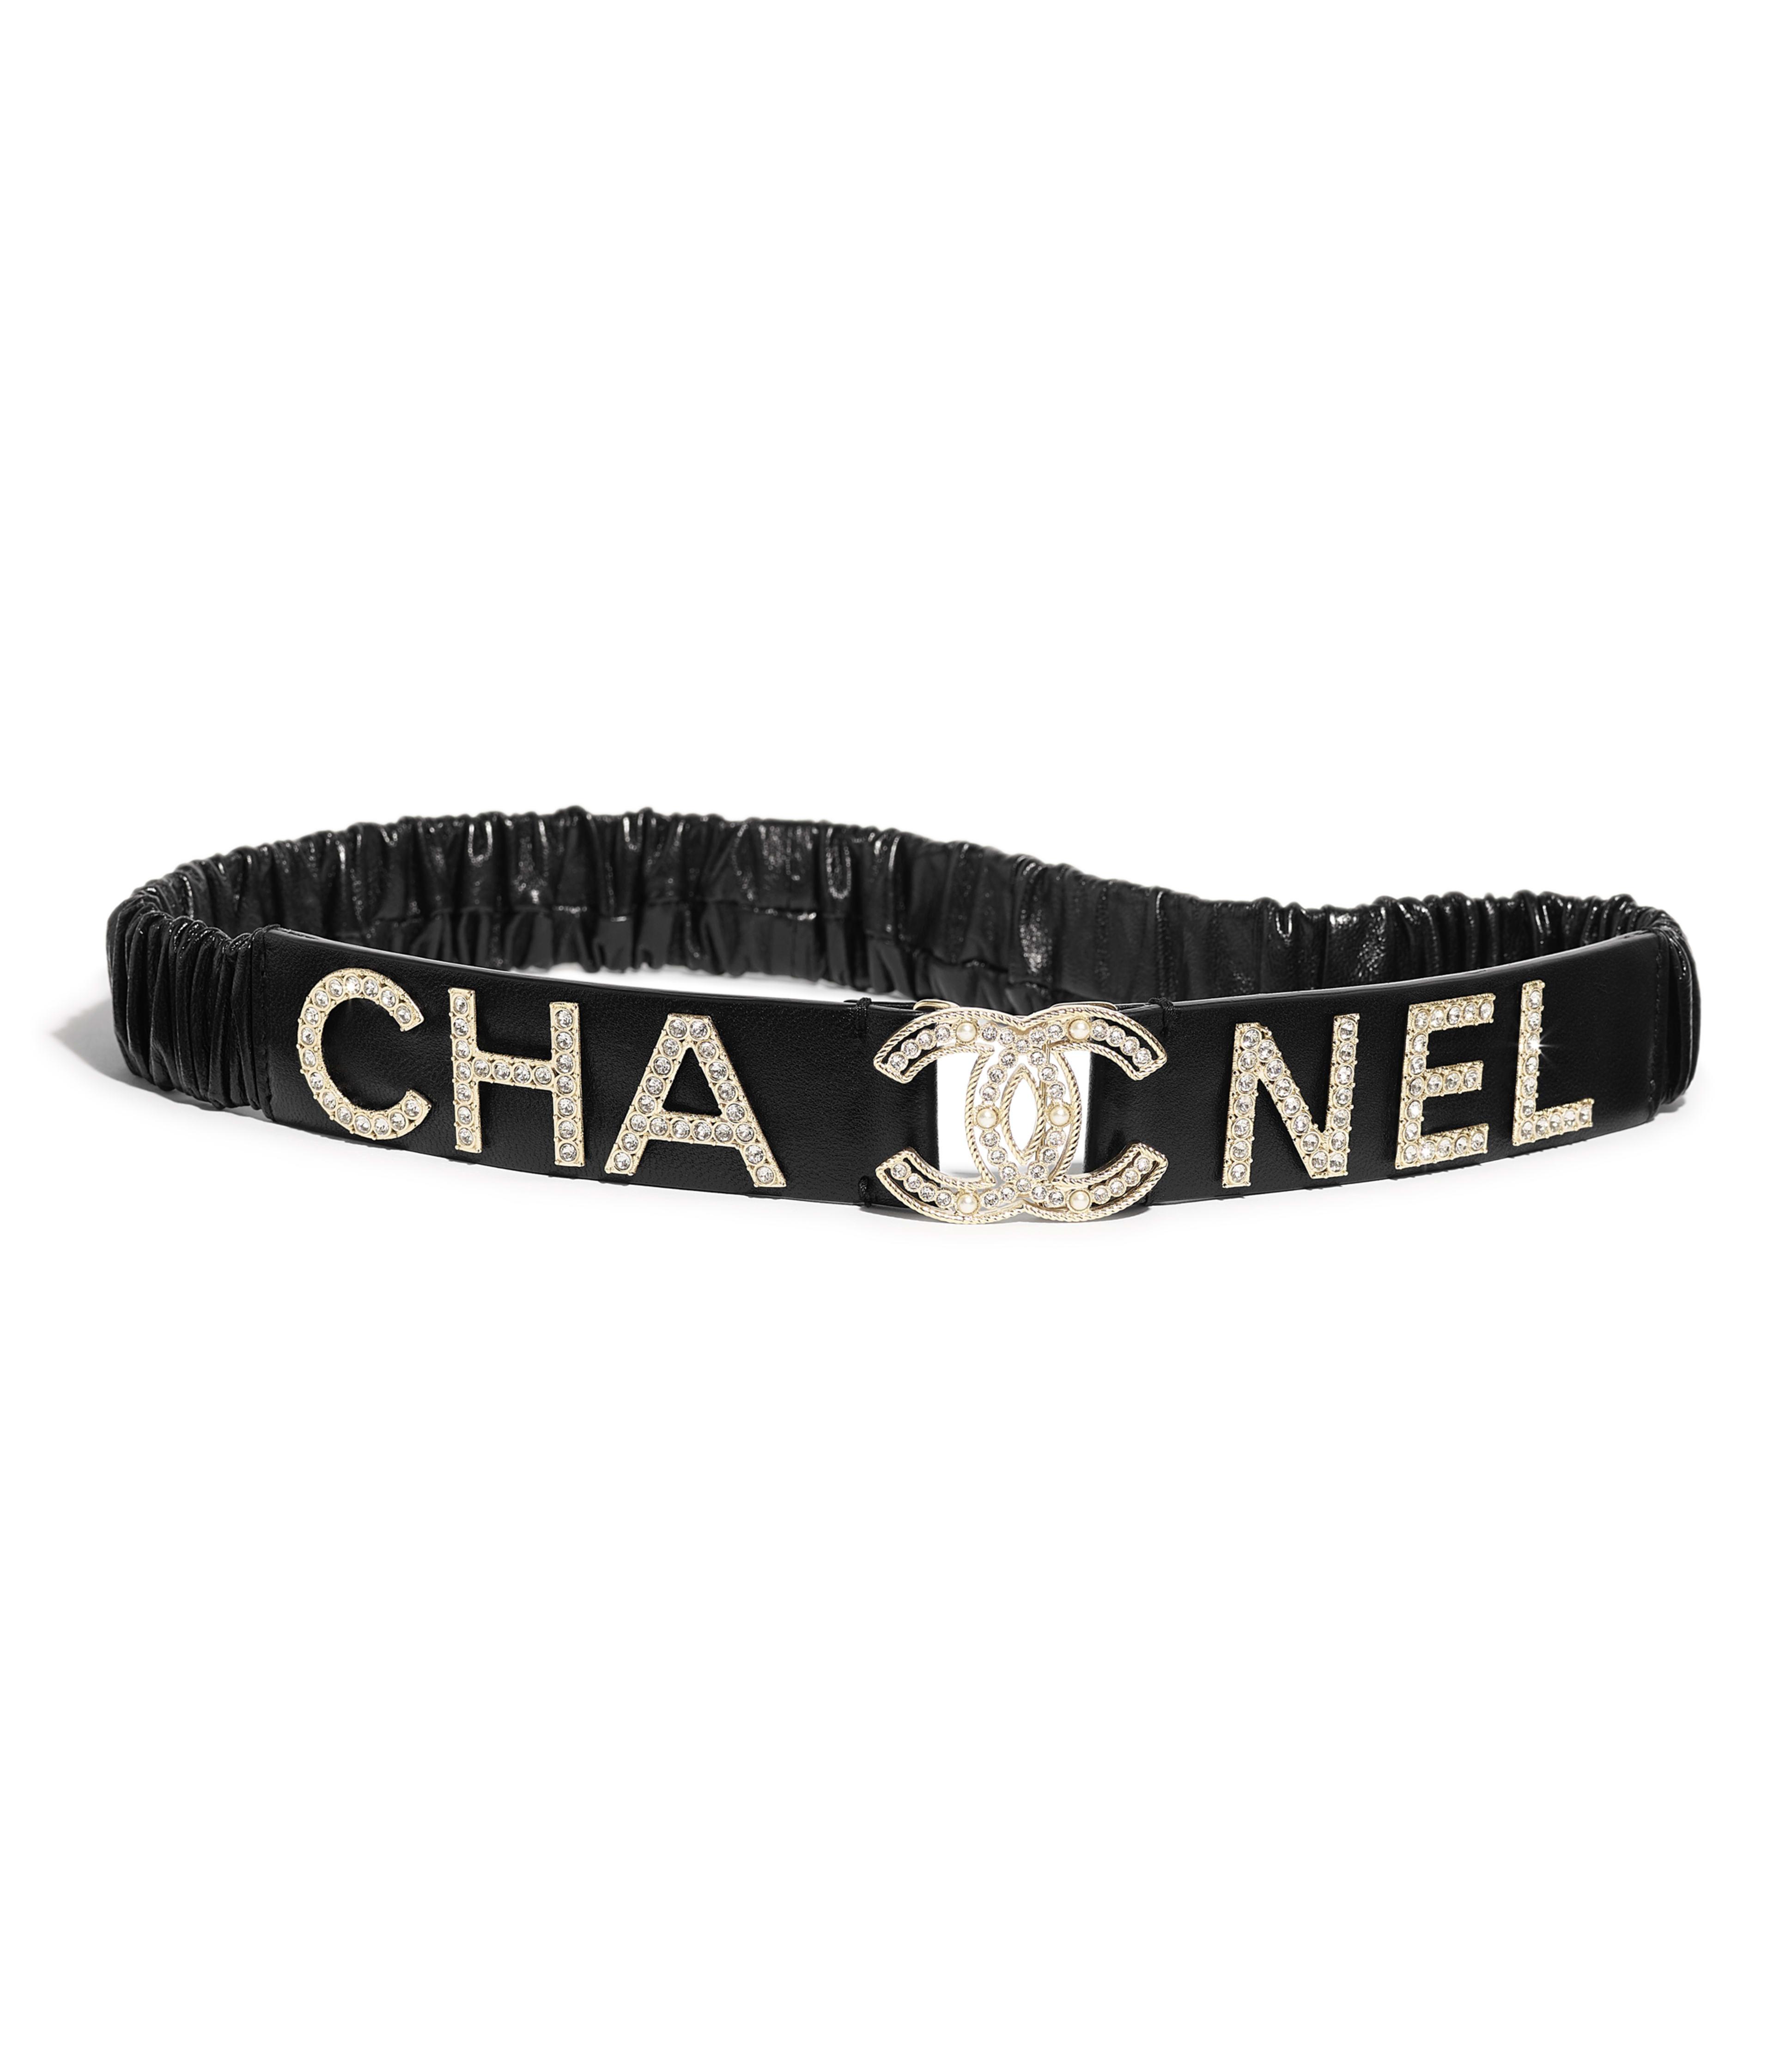 adffb35e506 Belts - Fashion